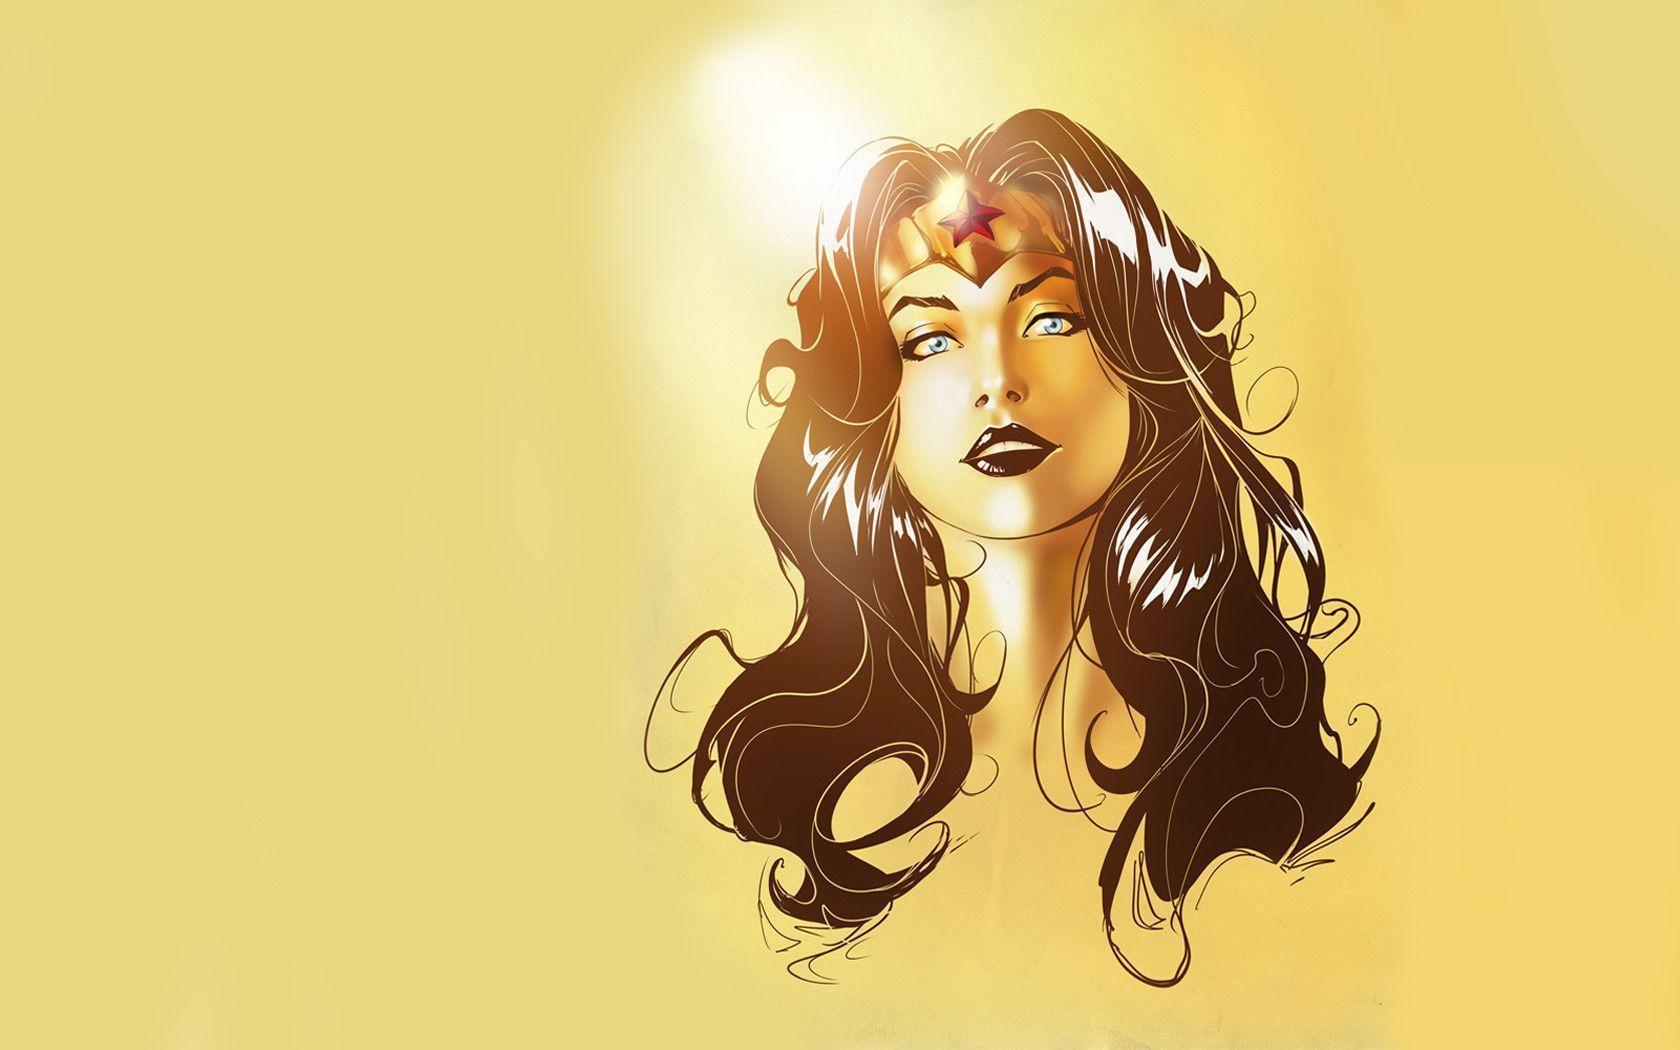 Download Heroines DC Wallpaper 1680x1050 | Wallpoper #317869